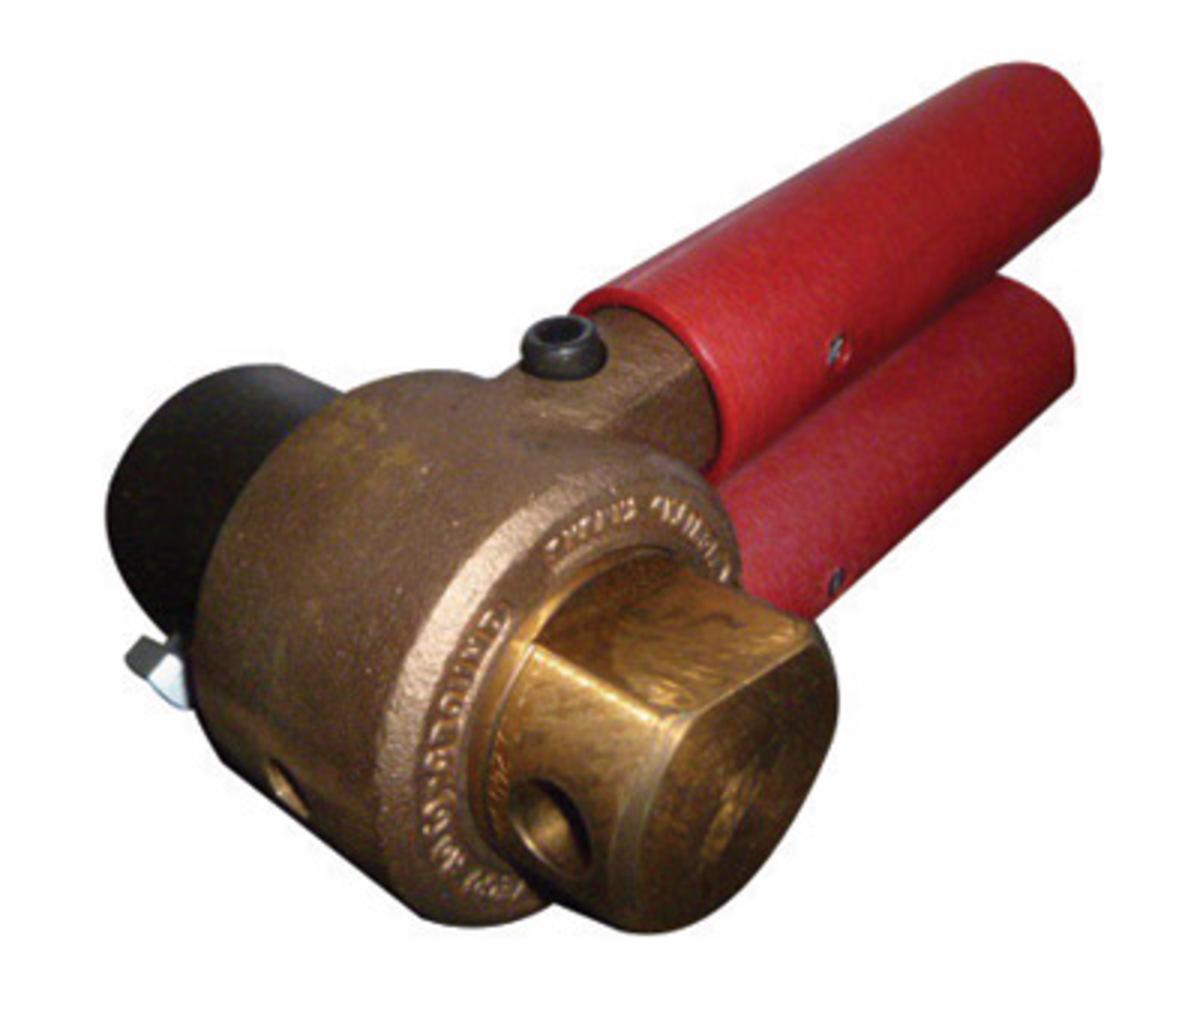 Airgas twe9250 1124 tweco rg 240 800 amp roto ground device for tweco rg 240 800 amp roto ground device for 2 4 greentooth Choice Image